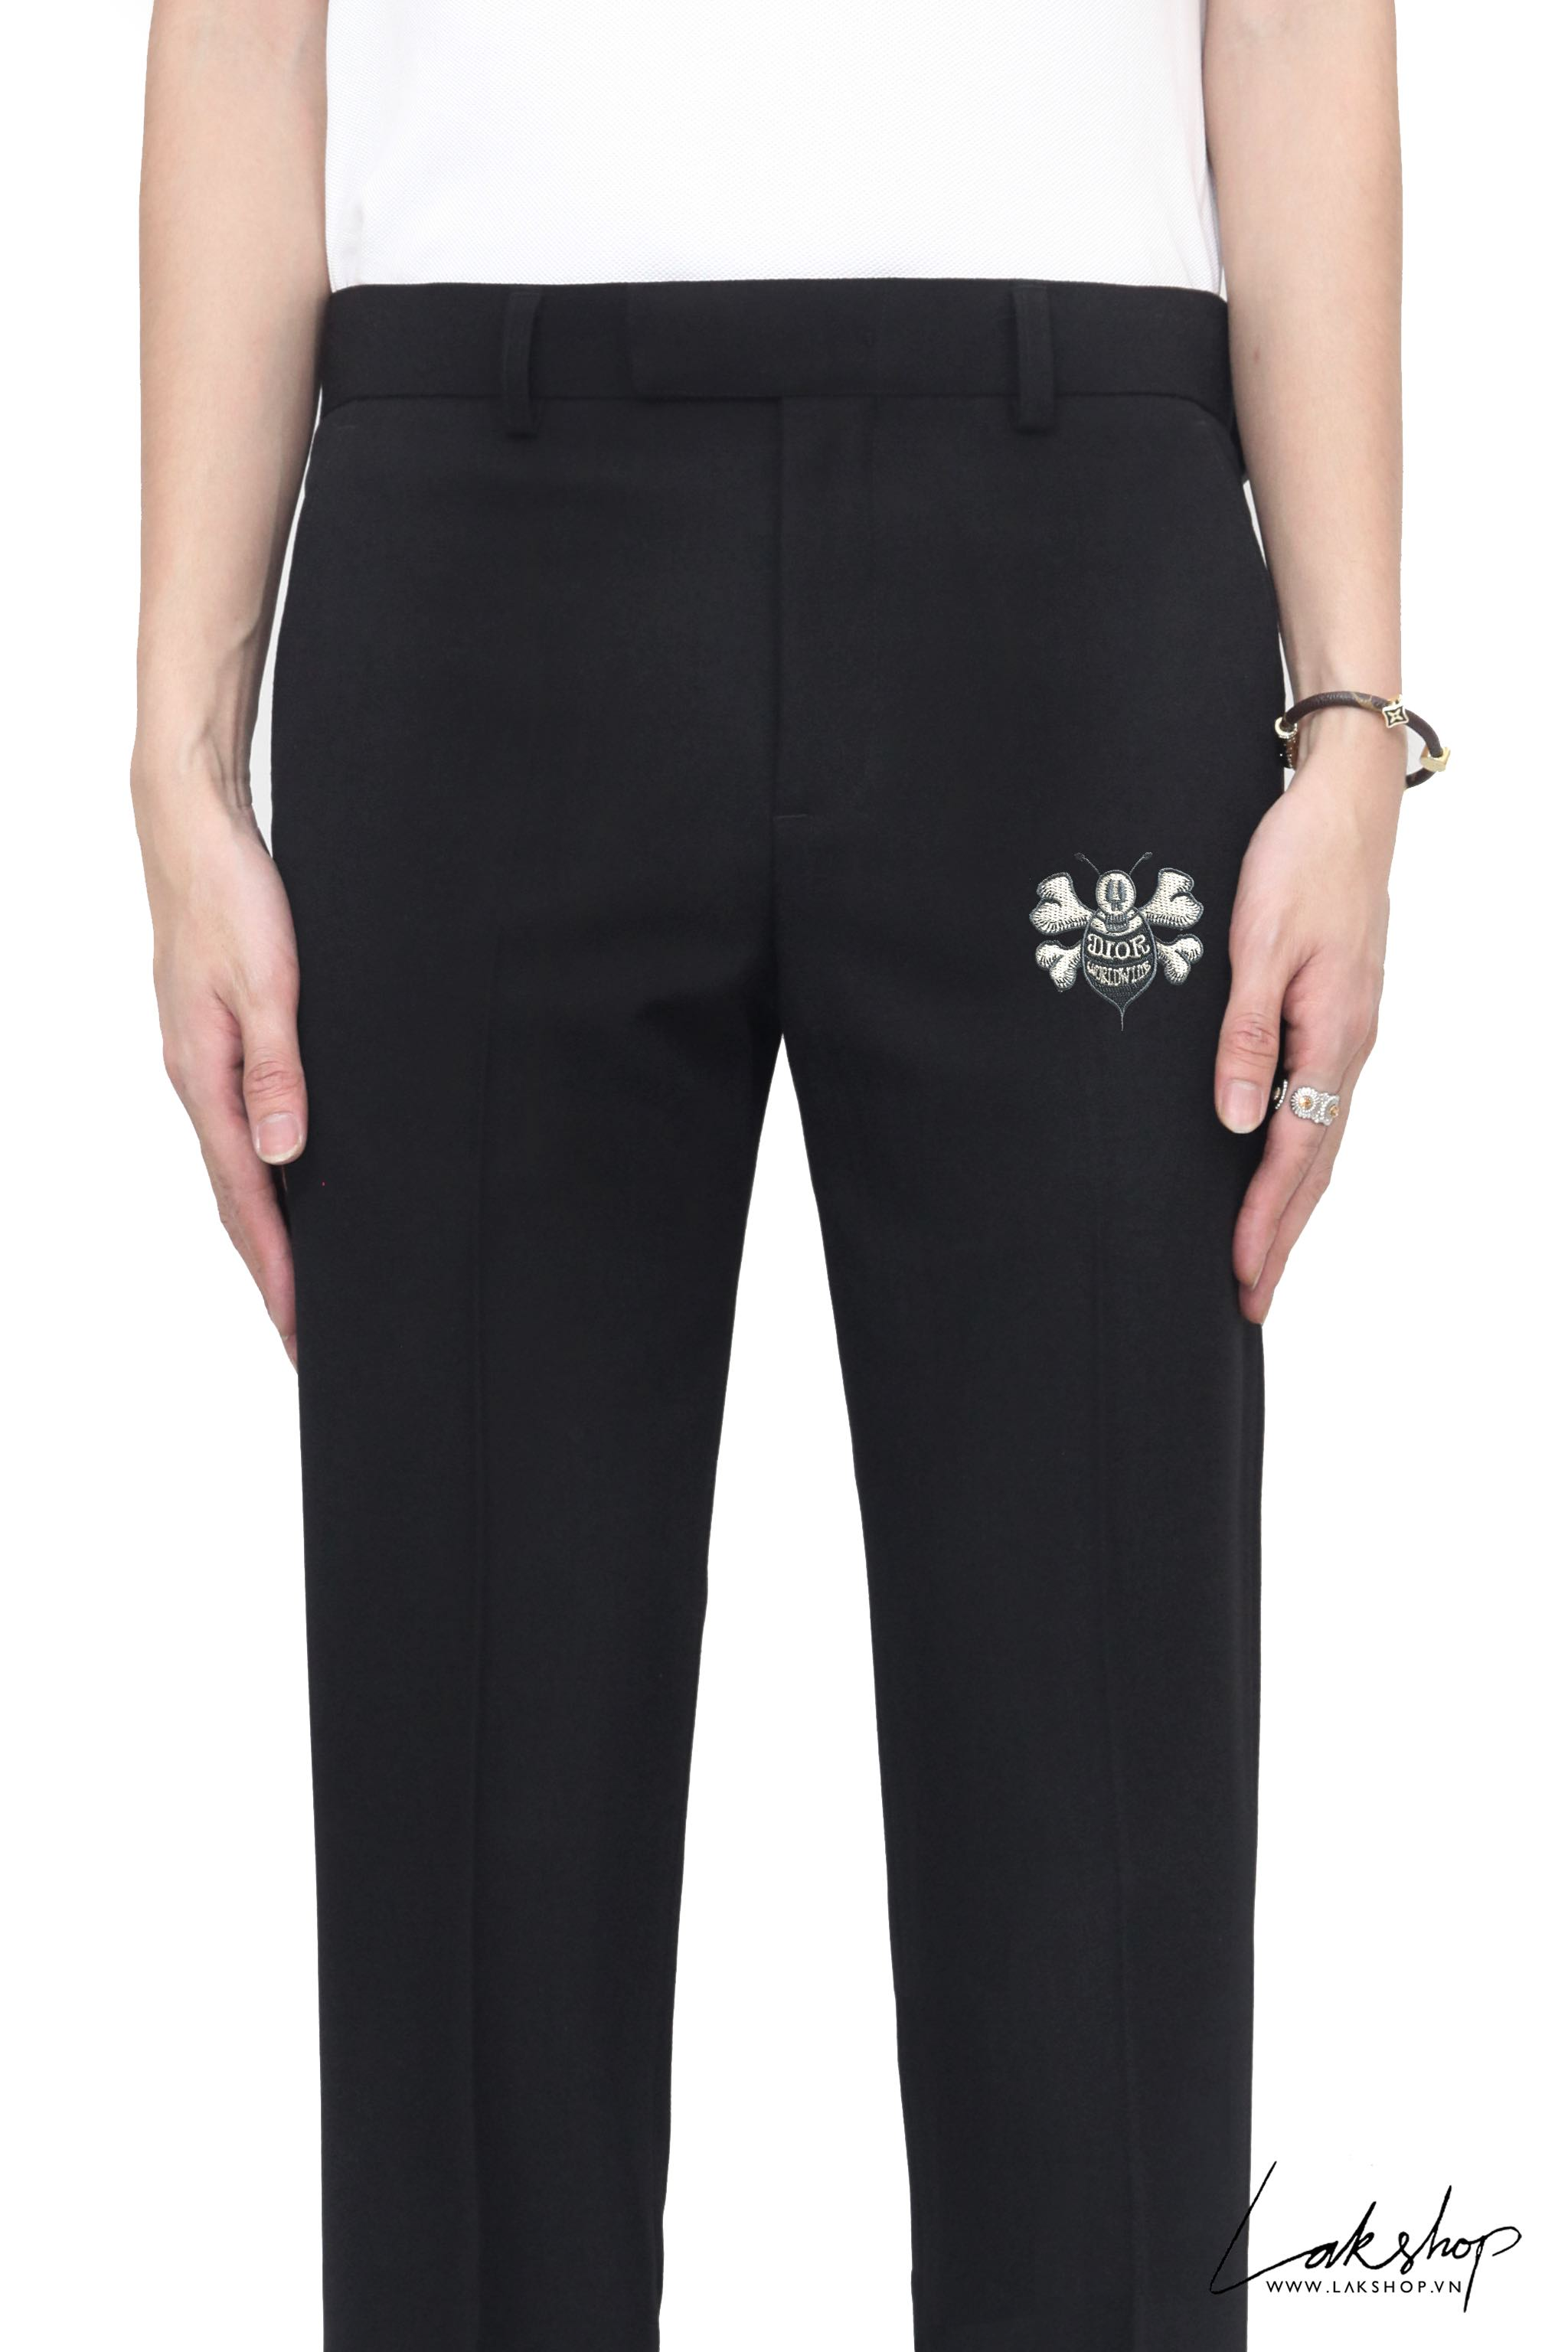 Dior x Stussy Bee Logo Black Trousers